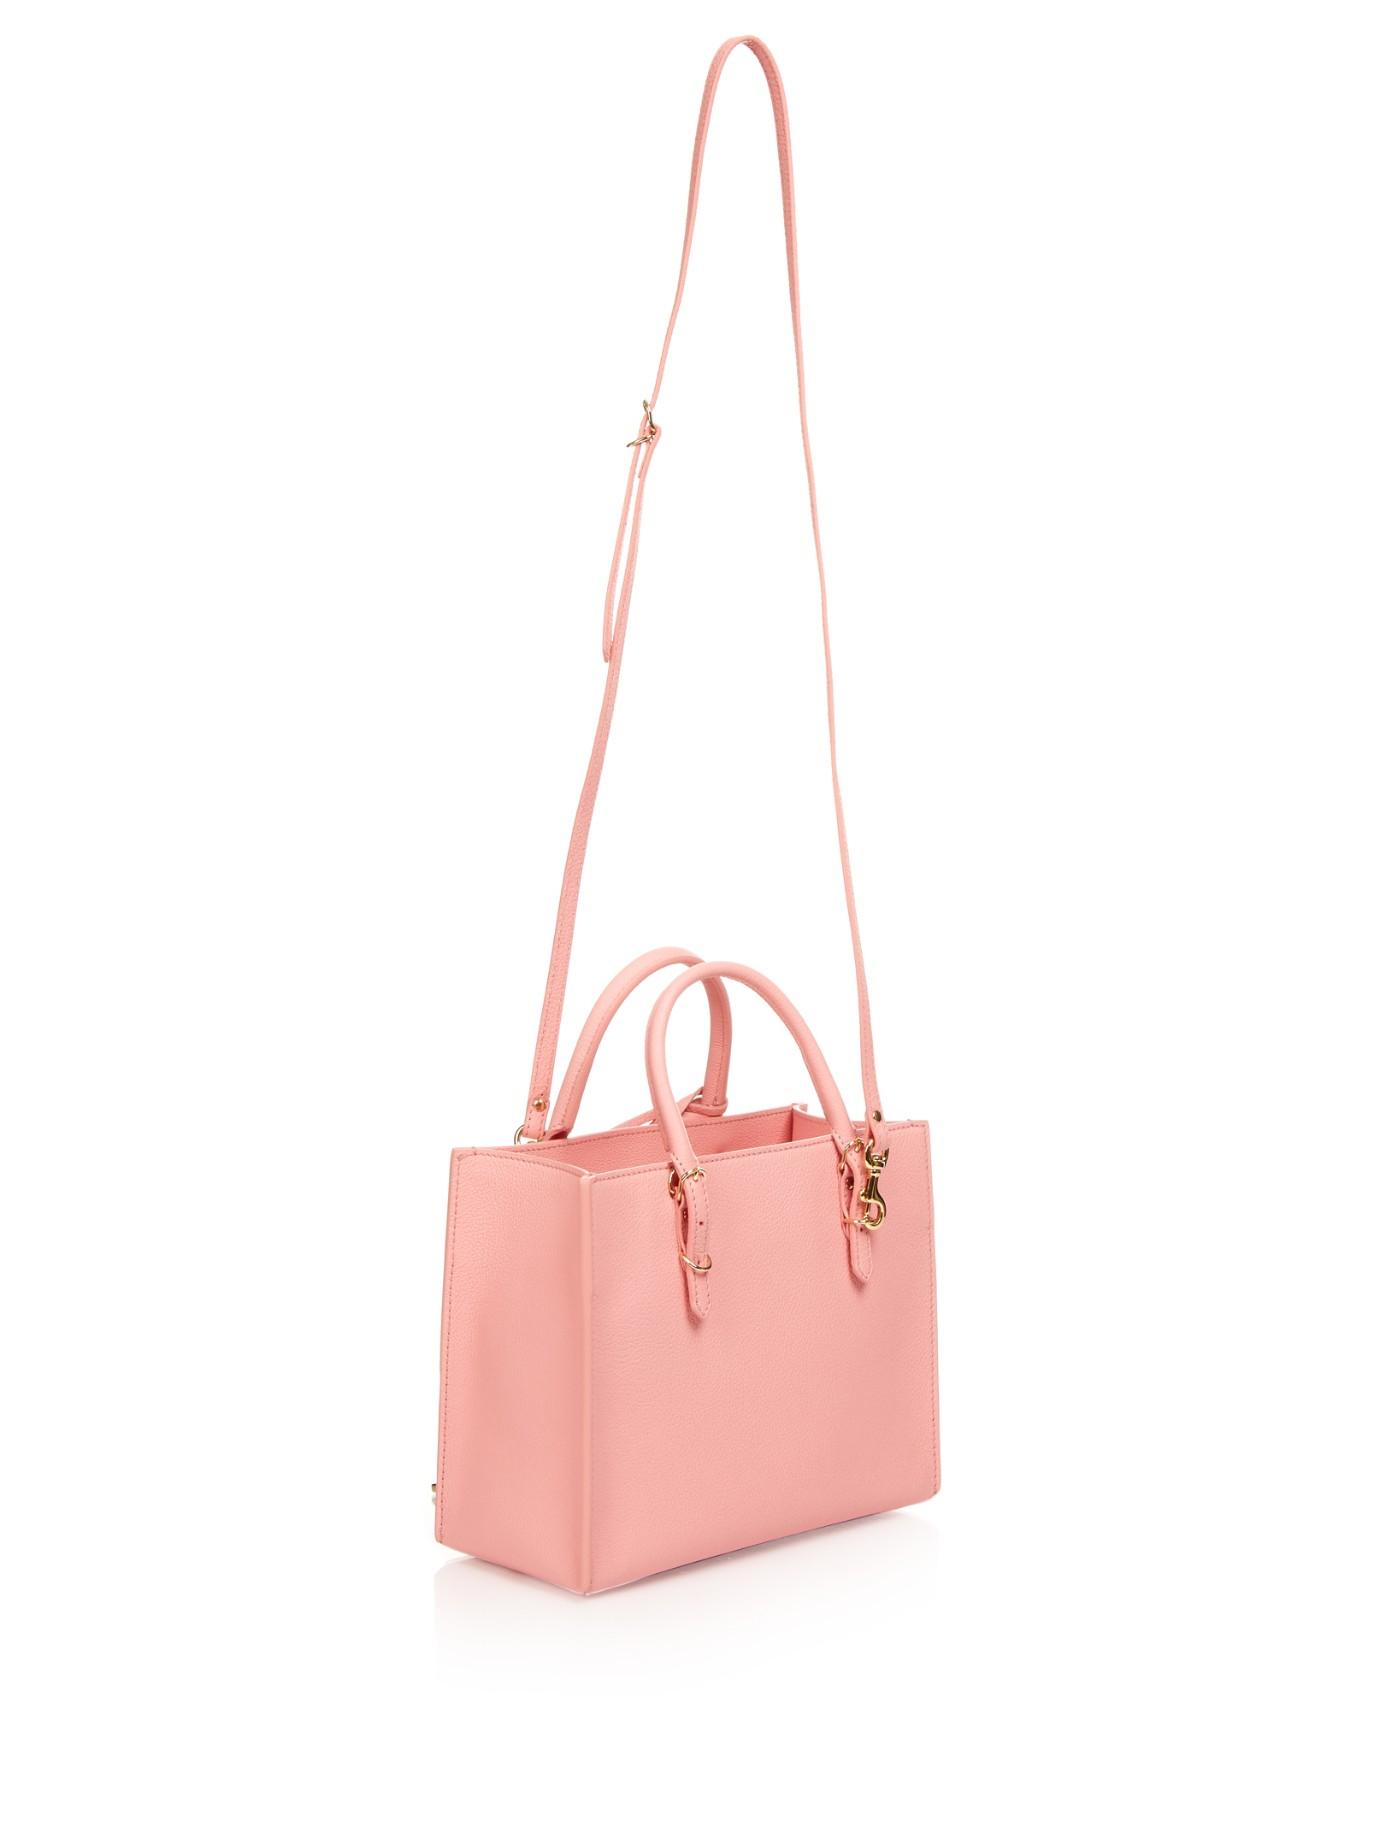 7ca630ac56 Balenciaga Papier A6 Metallic-Edge Leather Shoulder Bag in Pink - Lyst